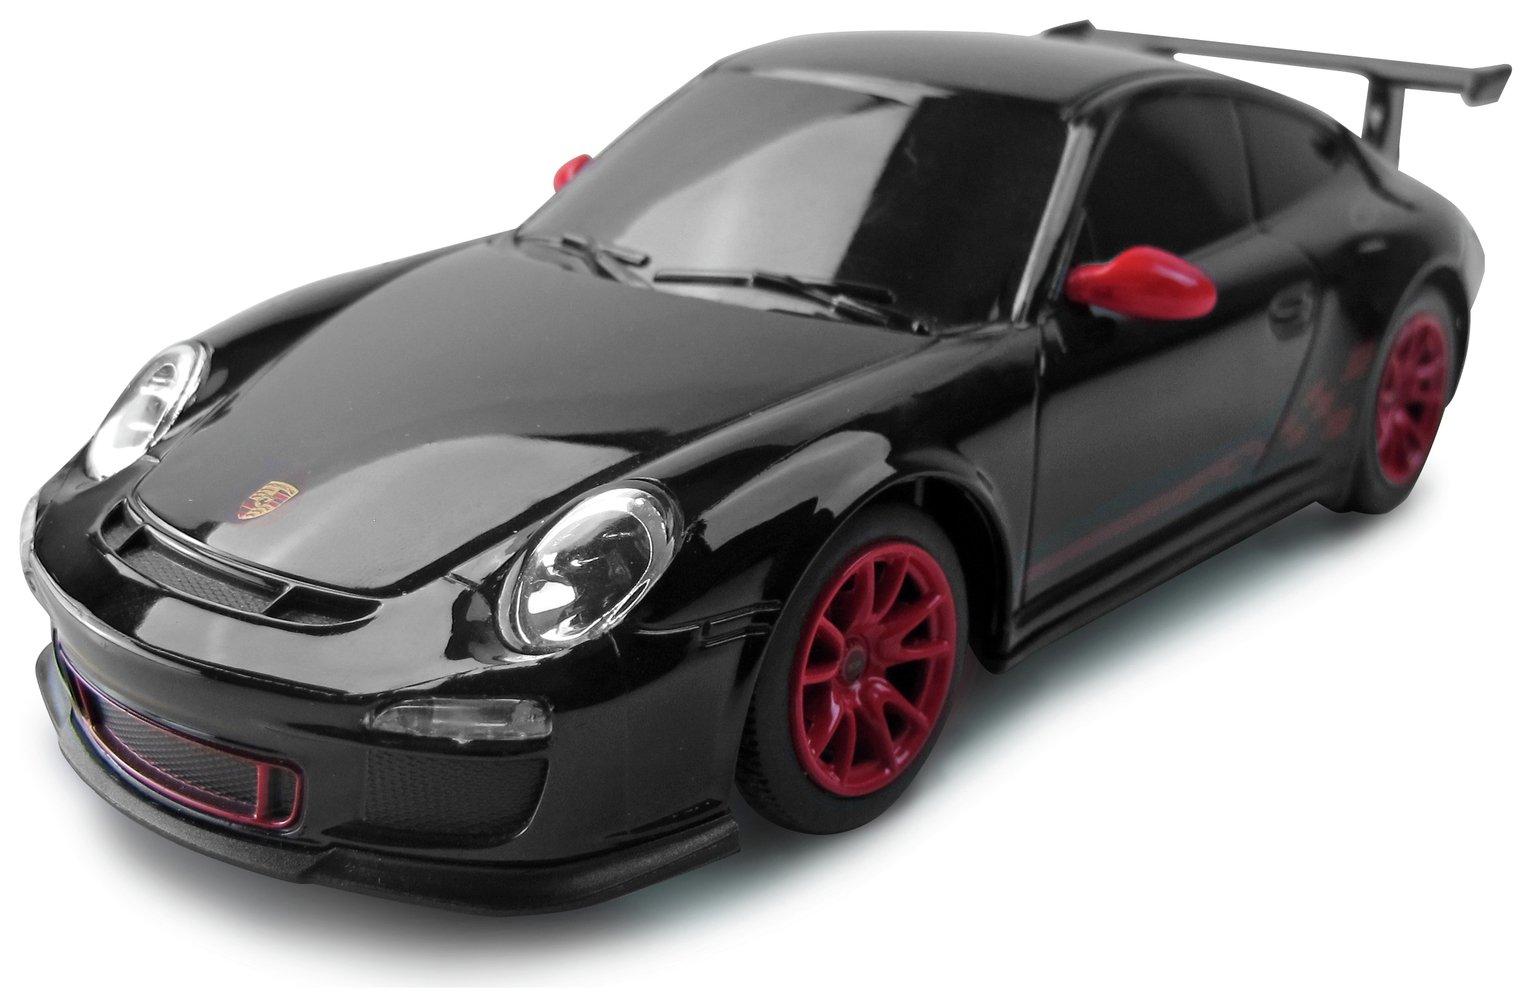 Porsche 911 GT3 RS Radio Controlled Car